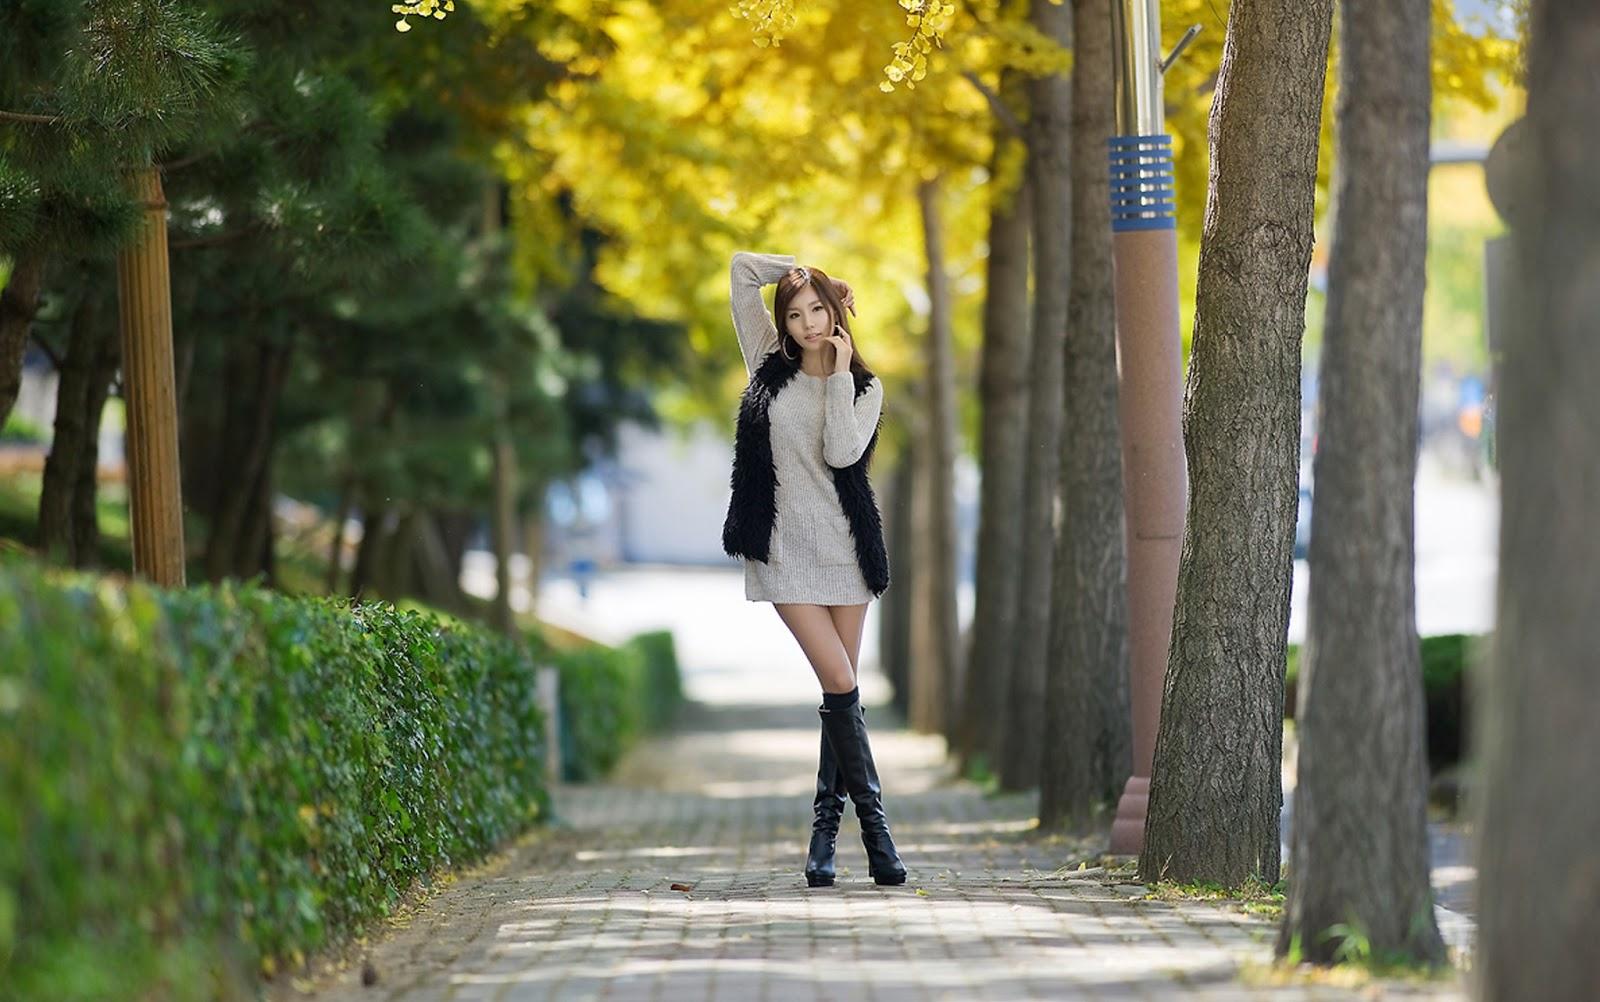 hinh-nen-hd-cho-may-tinh-nguoi-mau-han-quoc-dep-nice-girl-wallpaper-2013-456789